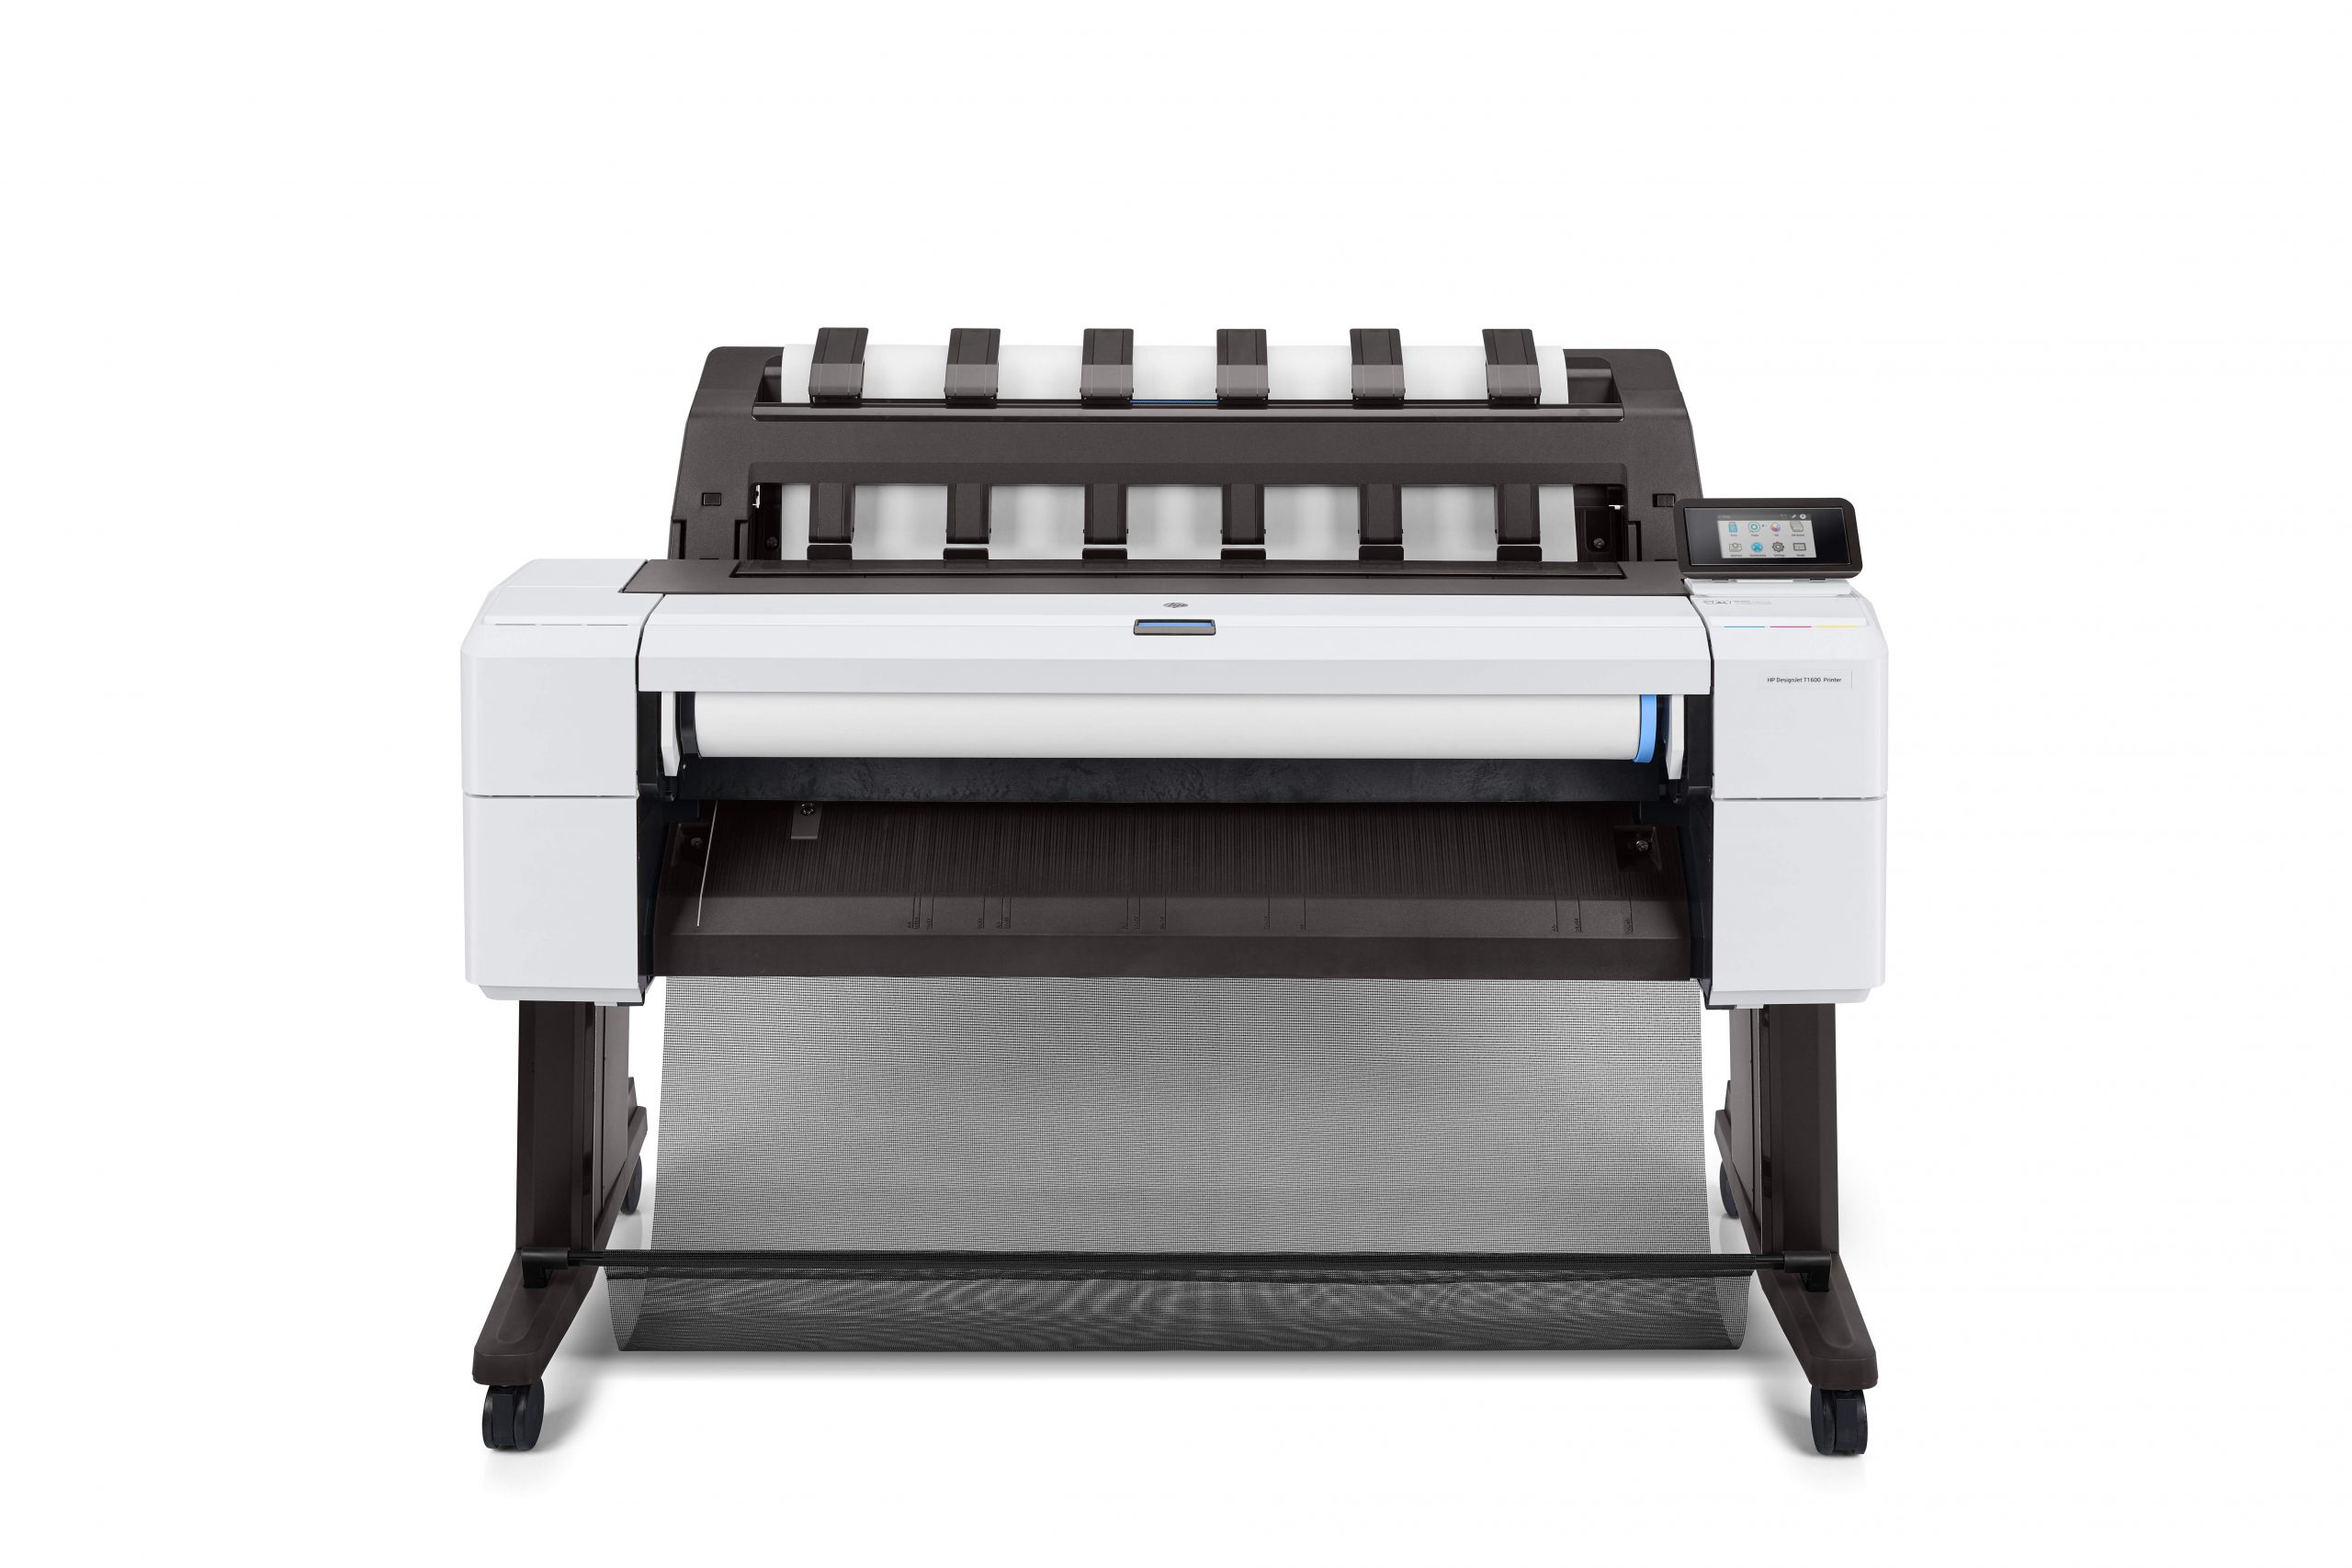 Designjet T1600 Front 01